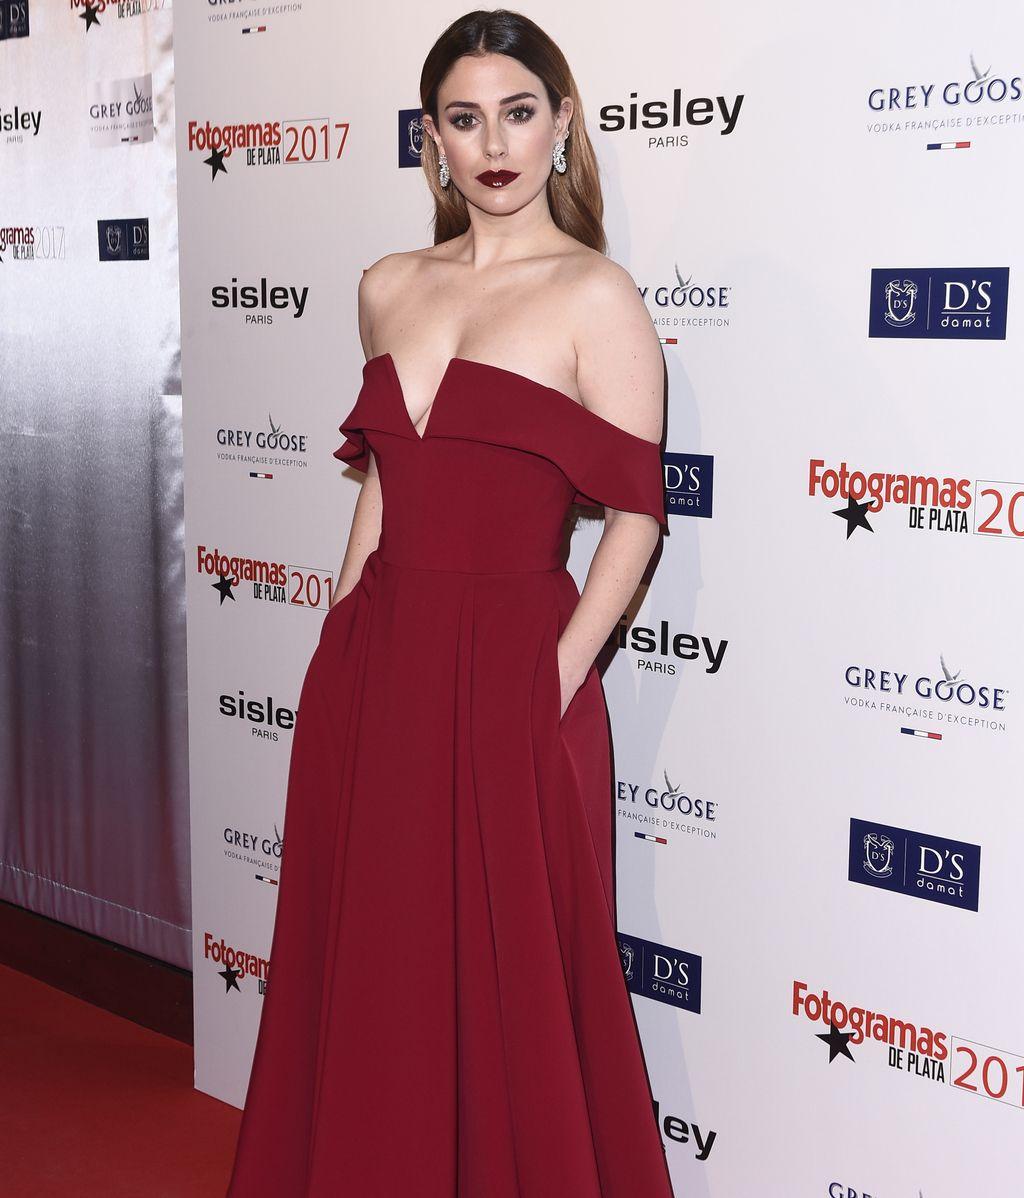 La alfombra roja de los Fotogramas de plata 2018 look a look